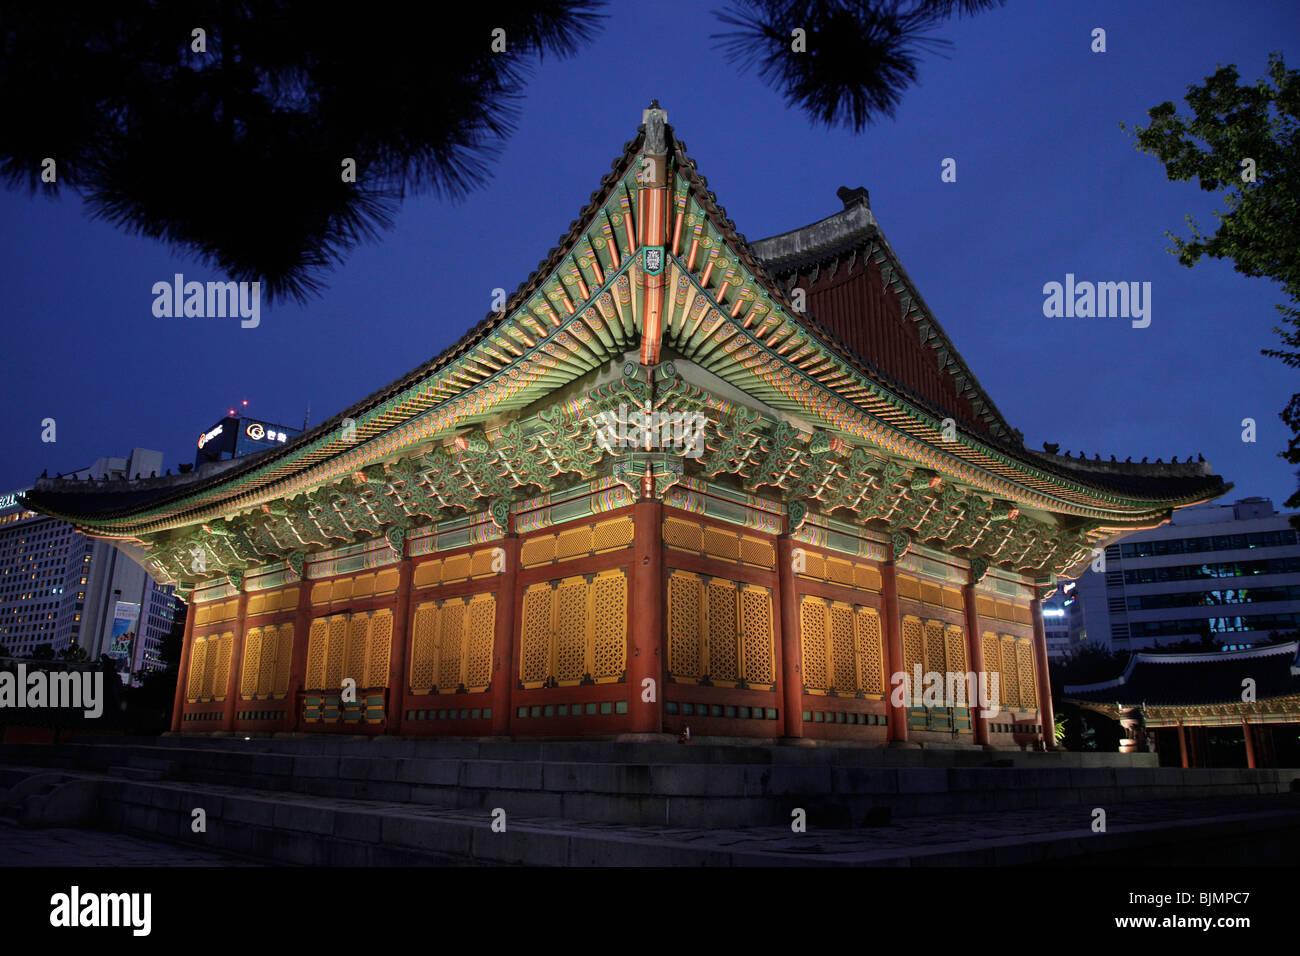 Deoksugung royal palace, Palace of Longevity, Korean capital Seoul, South Korea, Asia - Stock Image